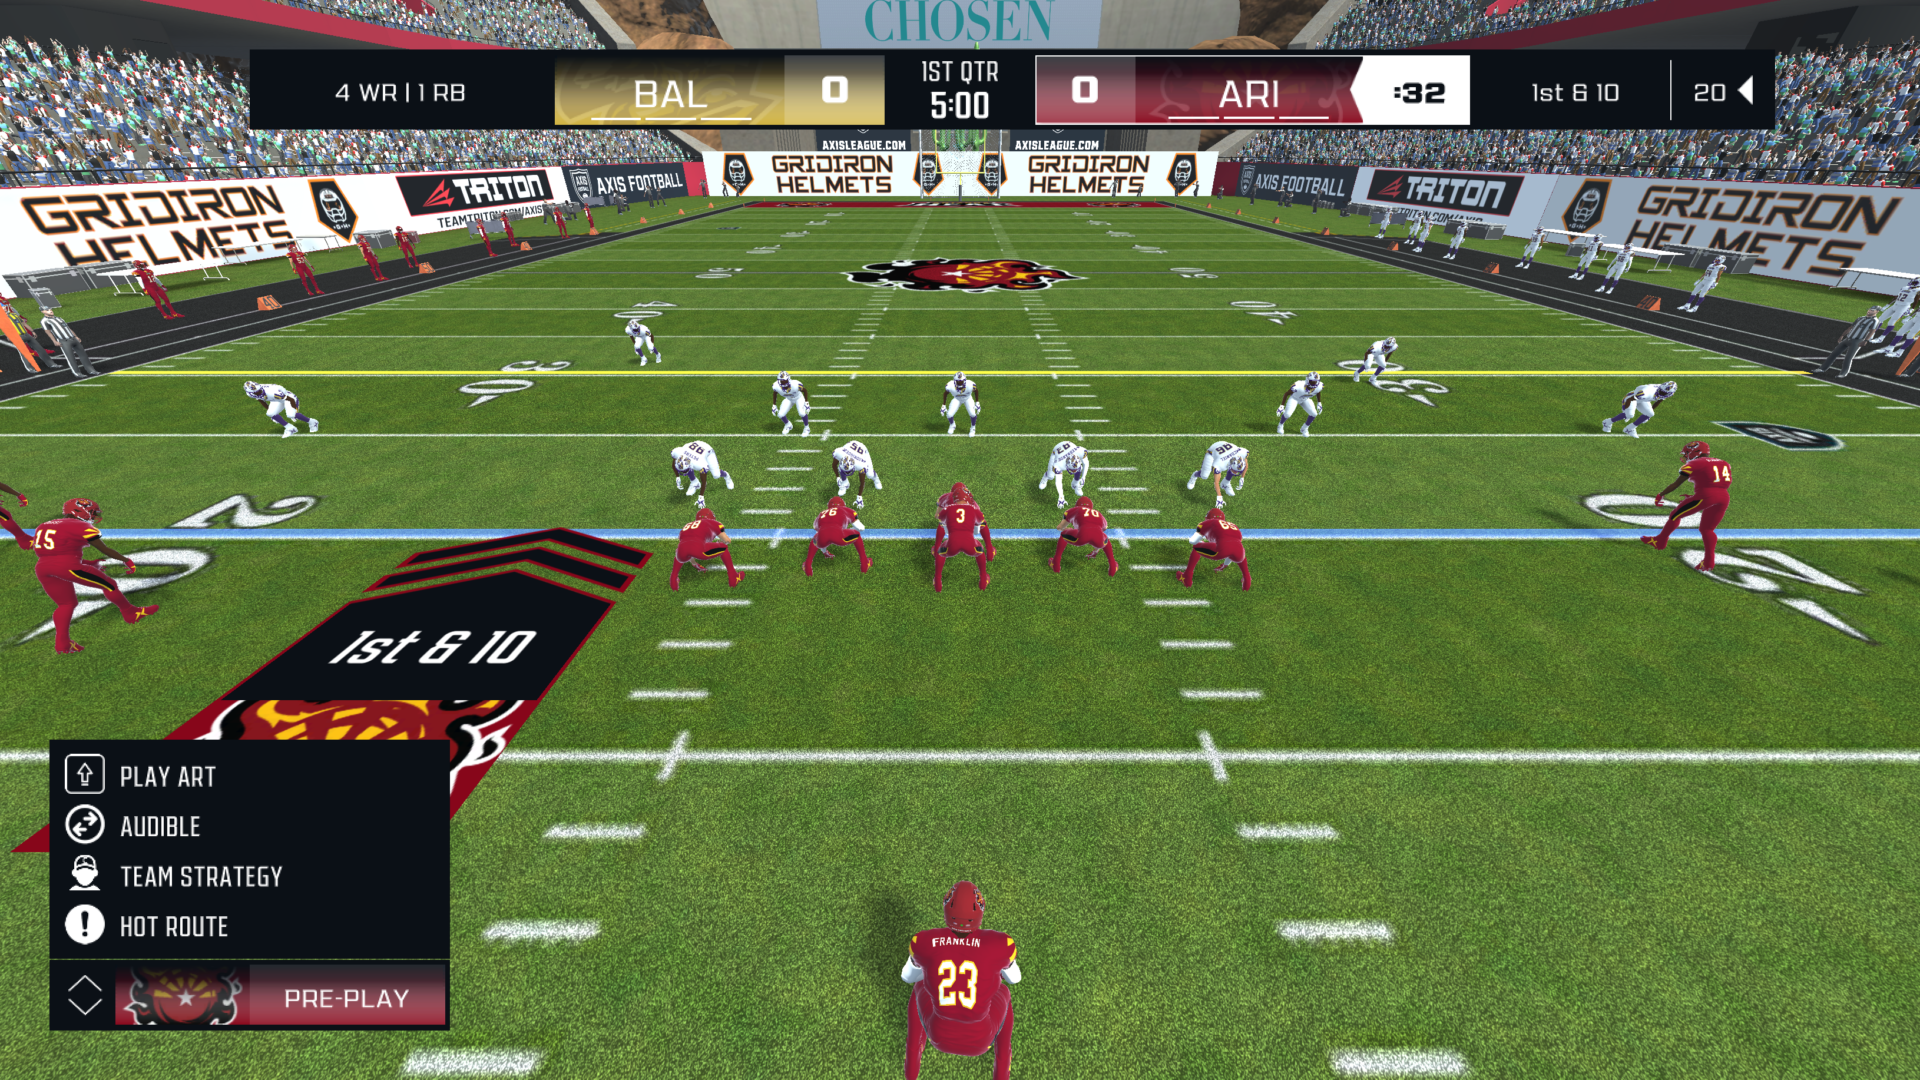 Axis Football 21 gameplay